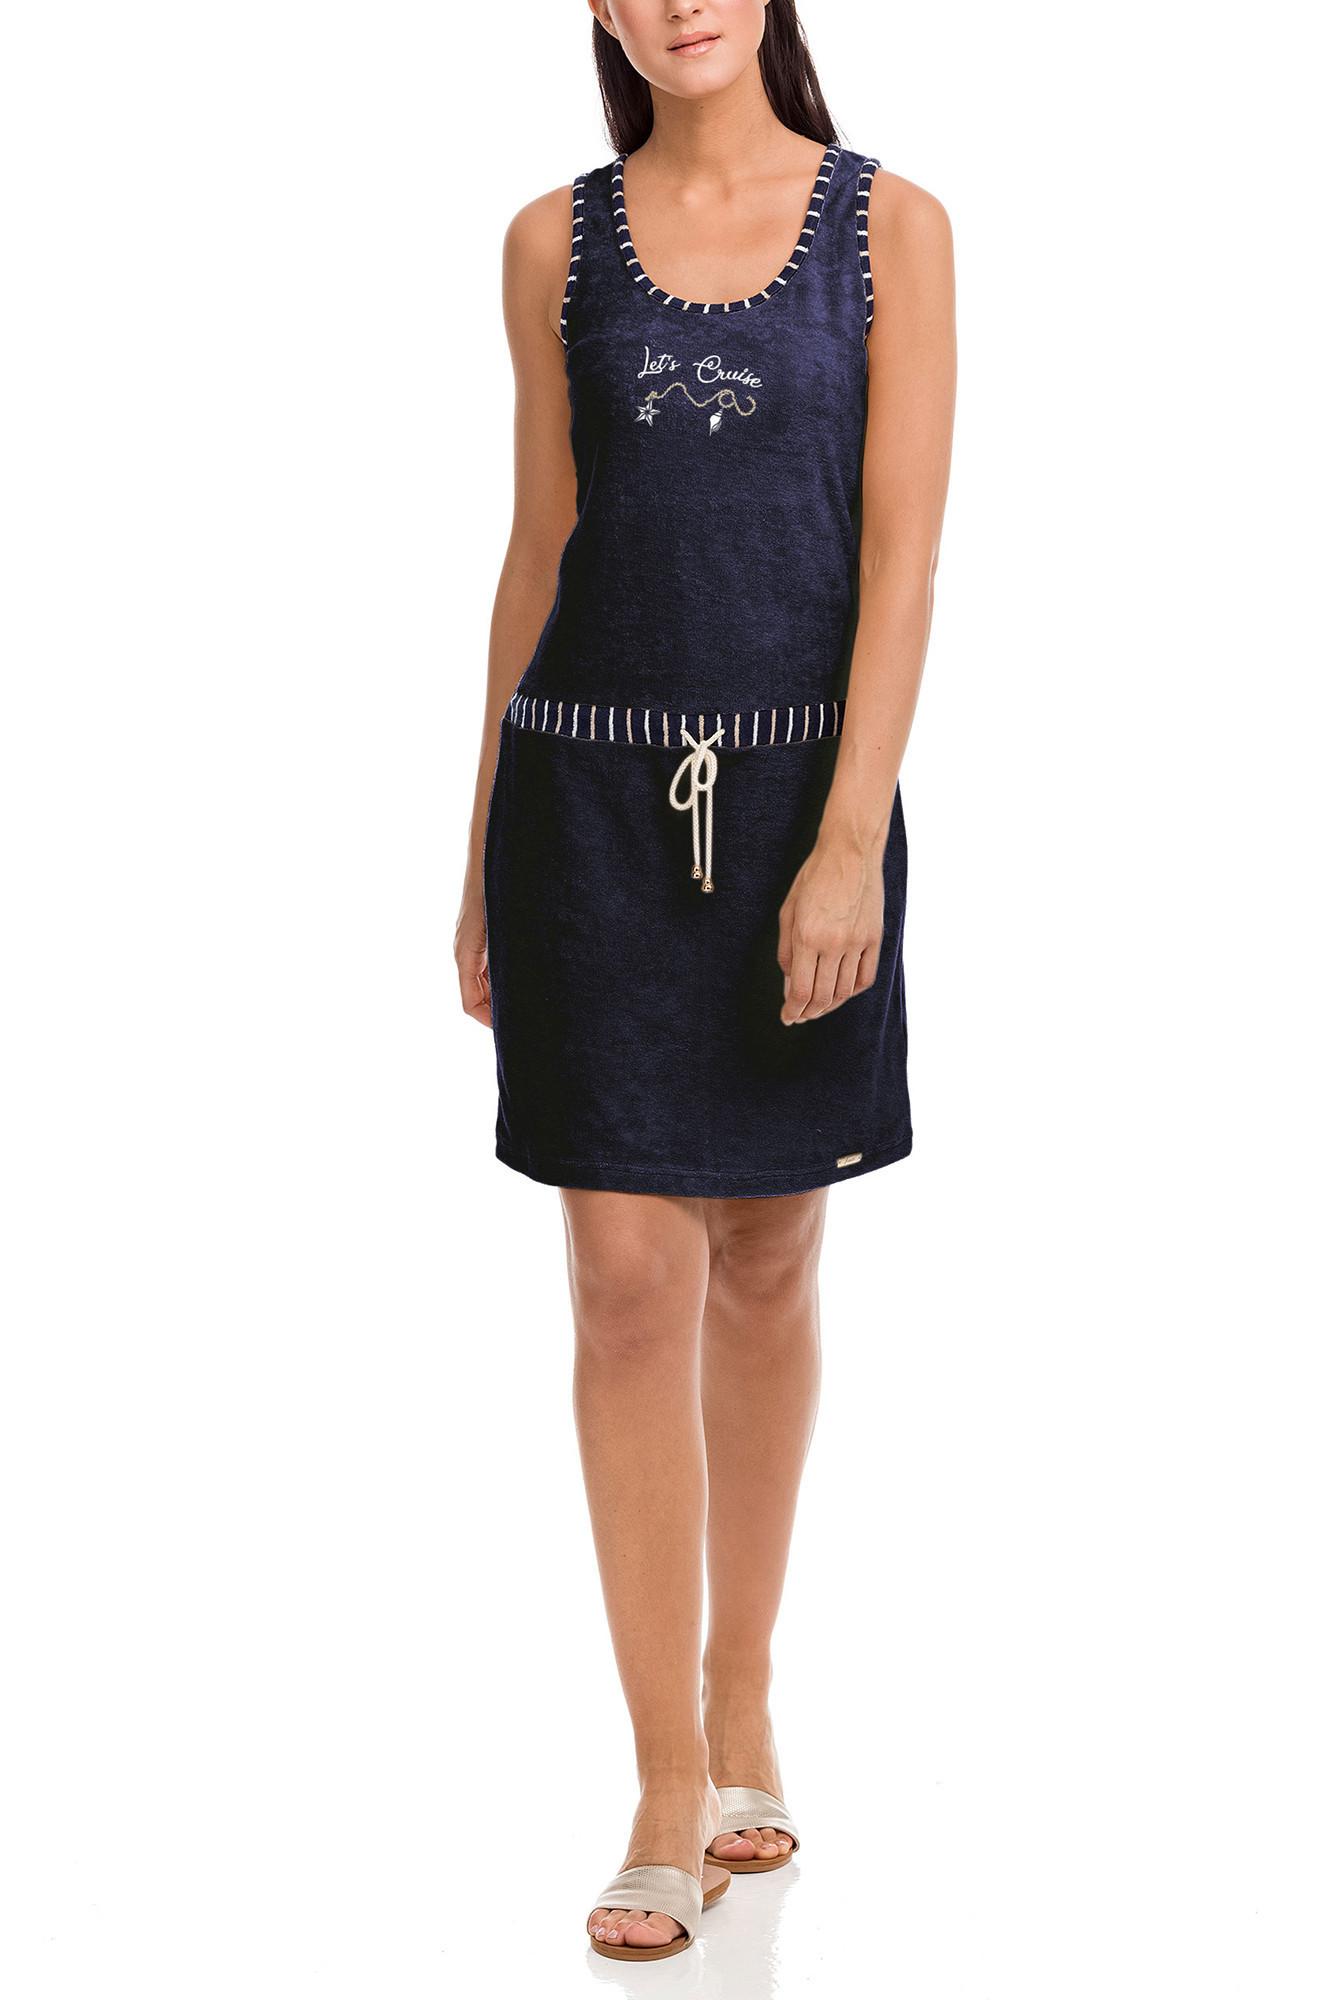 Vamp - Dámske šaty 12578 - Vamp Modrá m